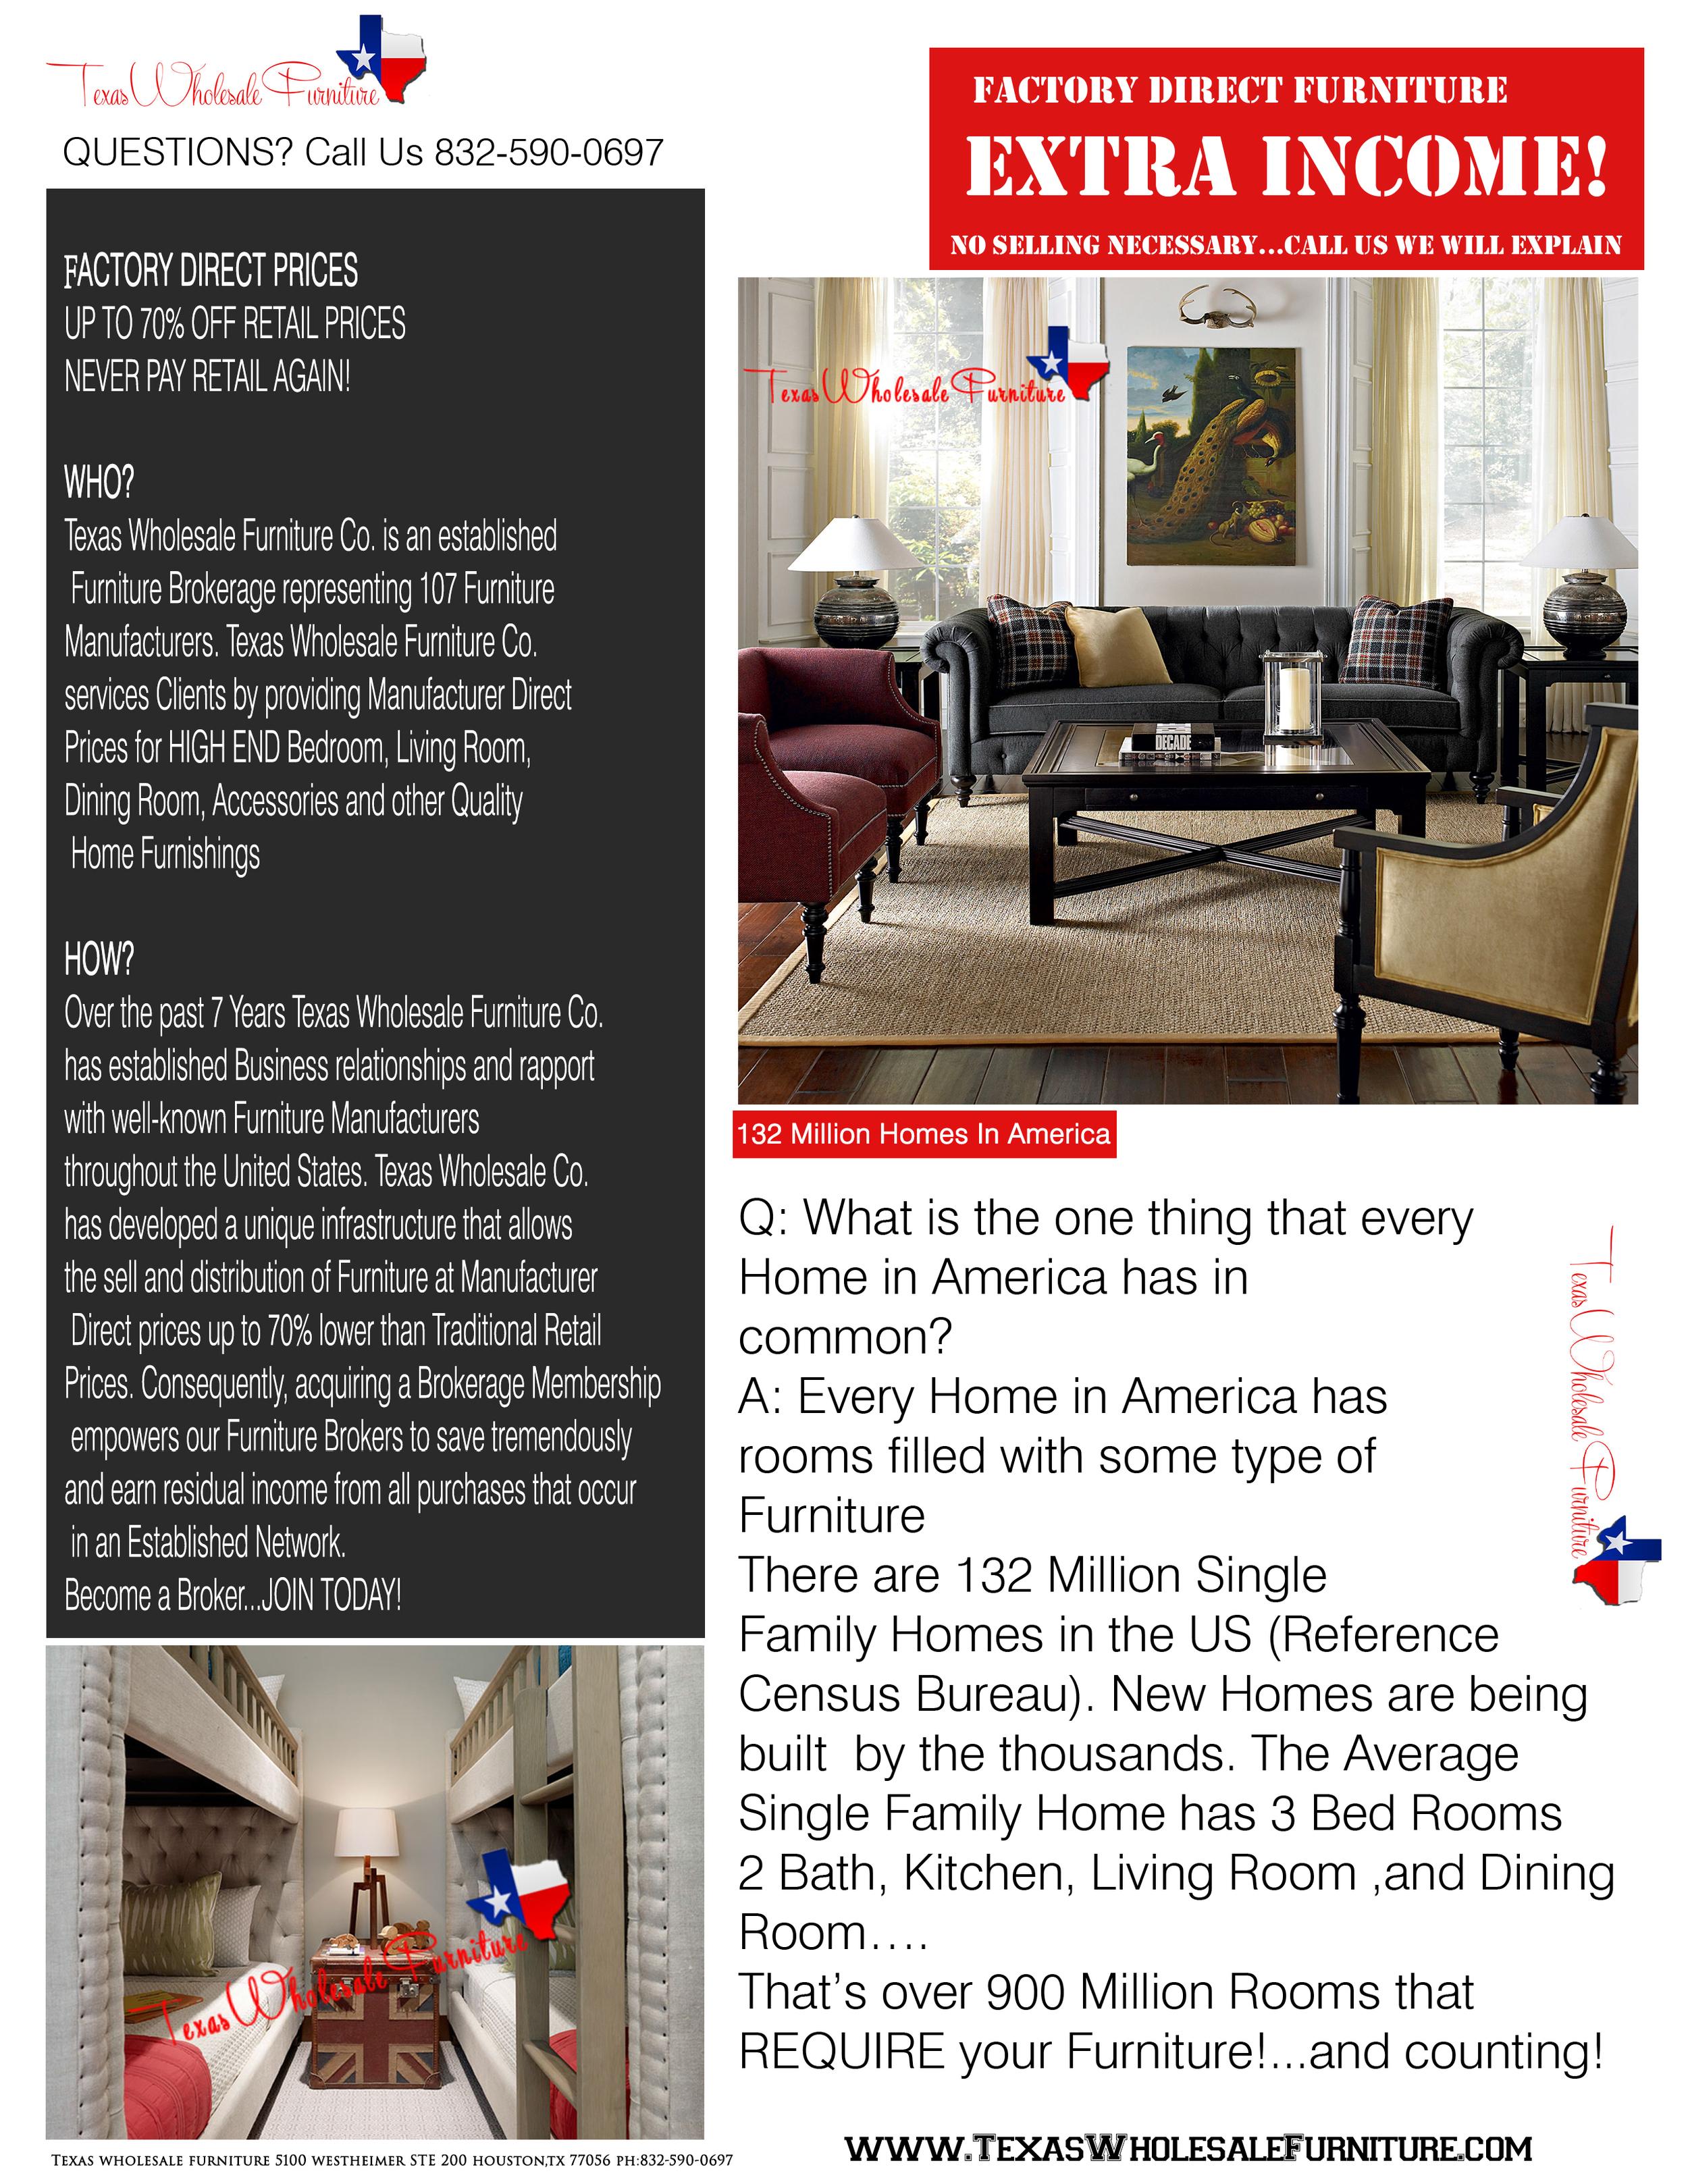 Furniture Broker Business Op